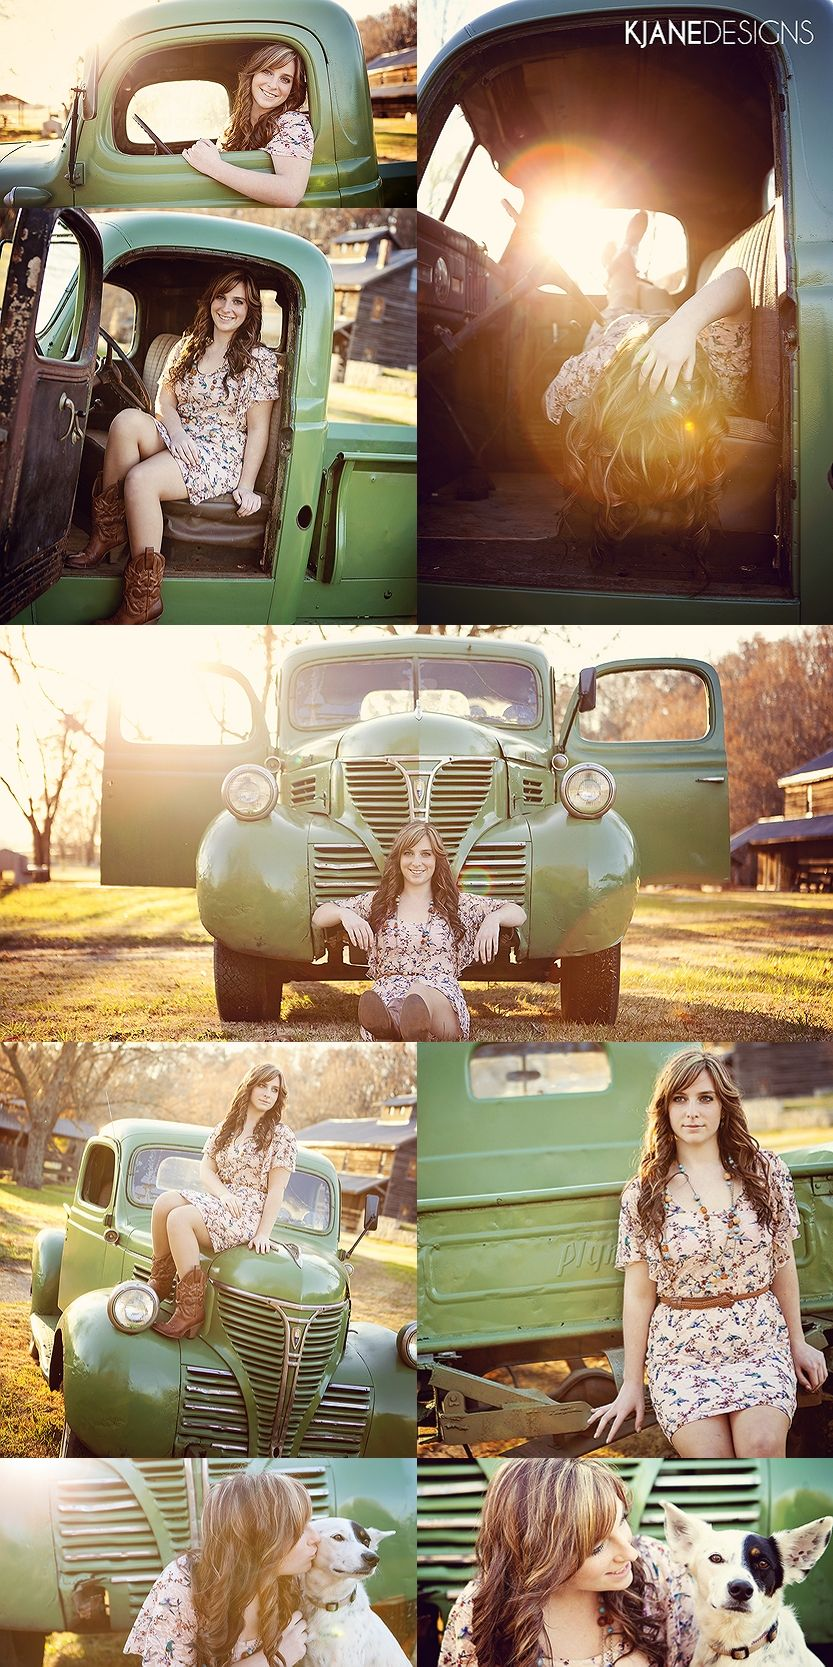 Senior Girl Photography - Senior Portraits - Vintage Truck | Photos by KJane Designs  (Possible idea for Fire truck)